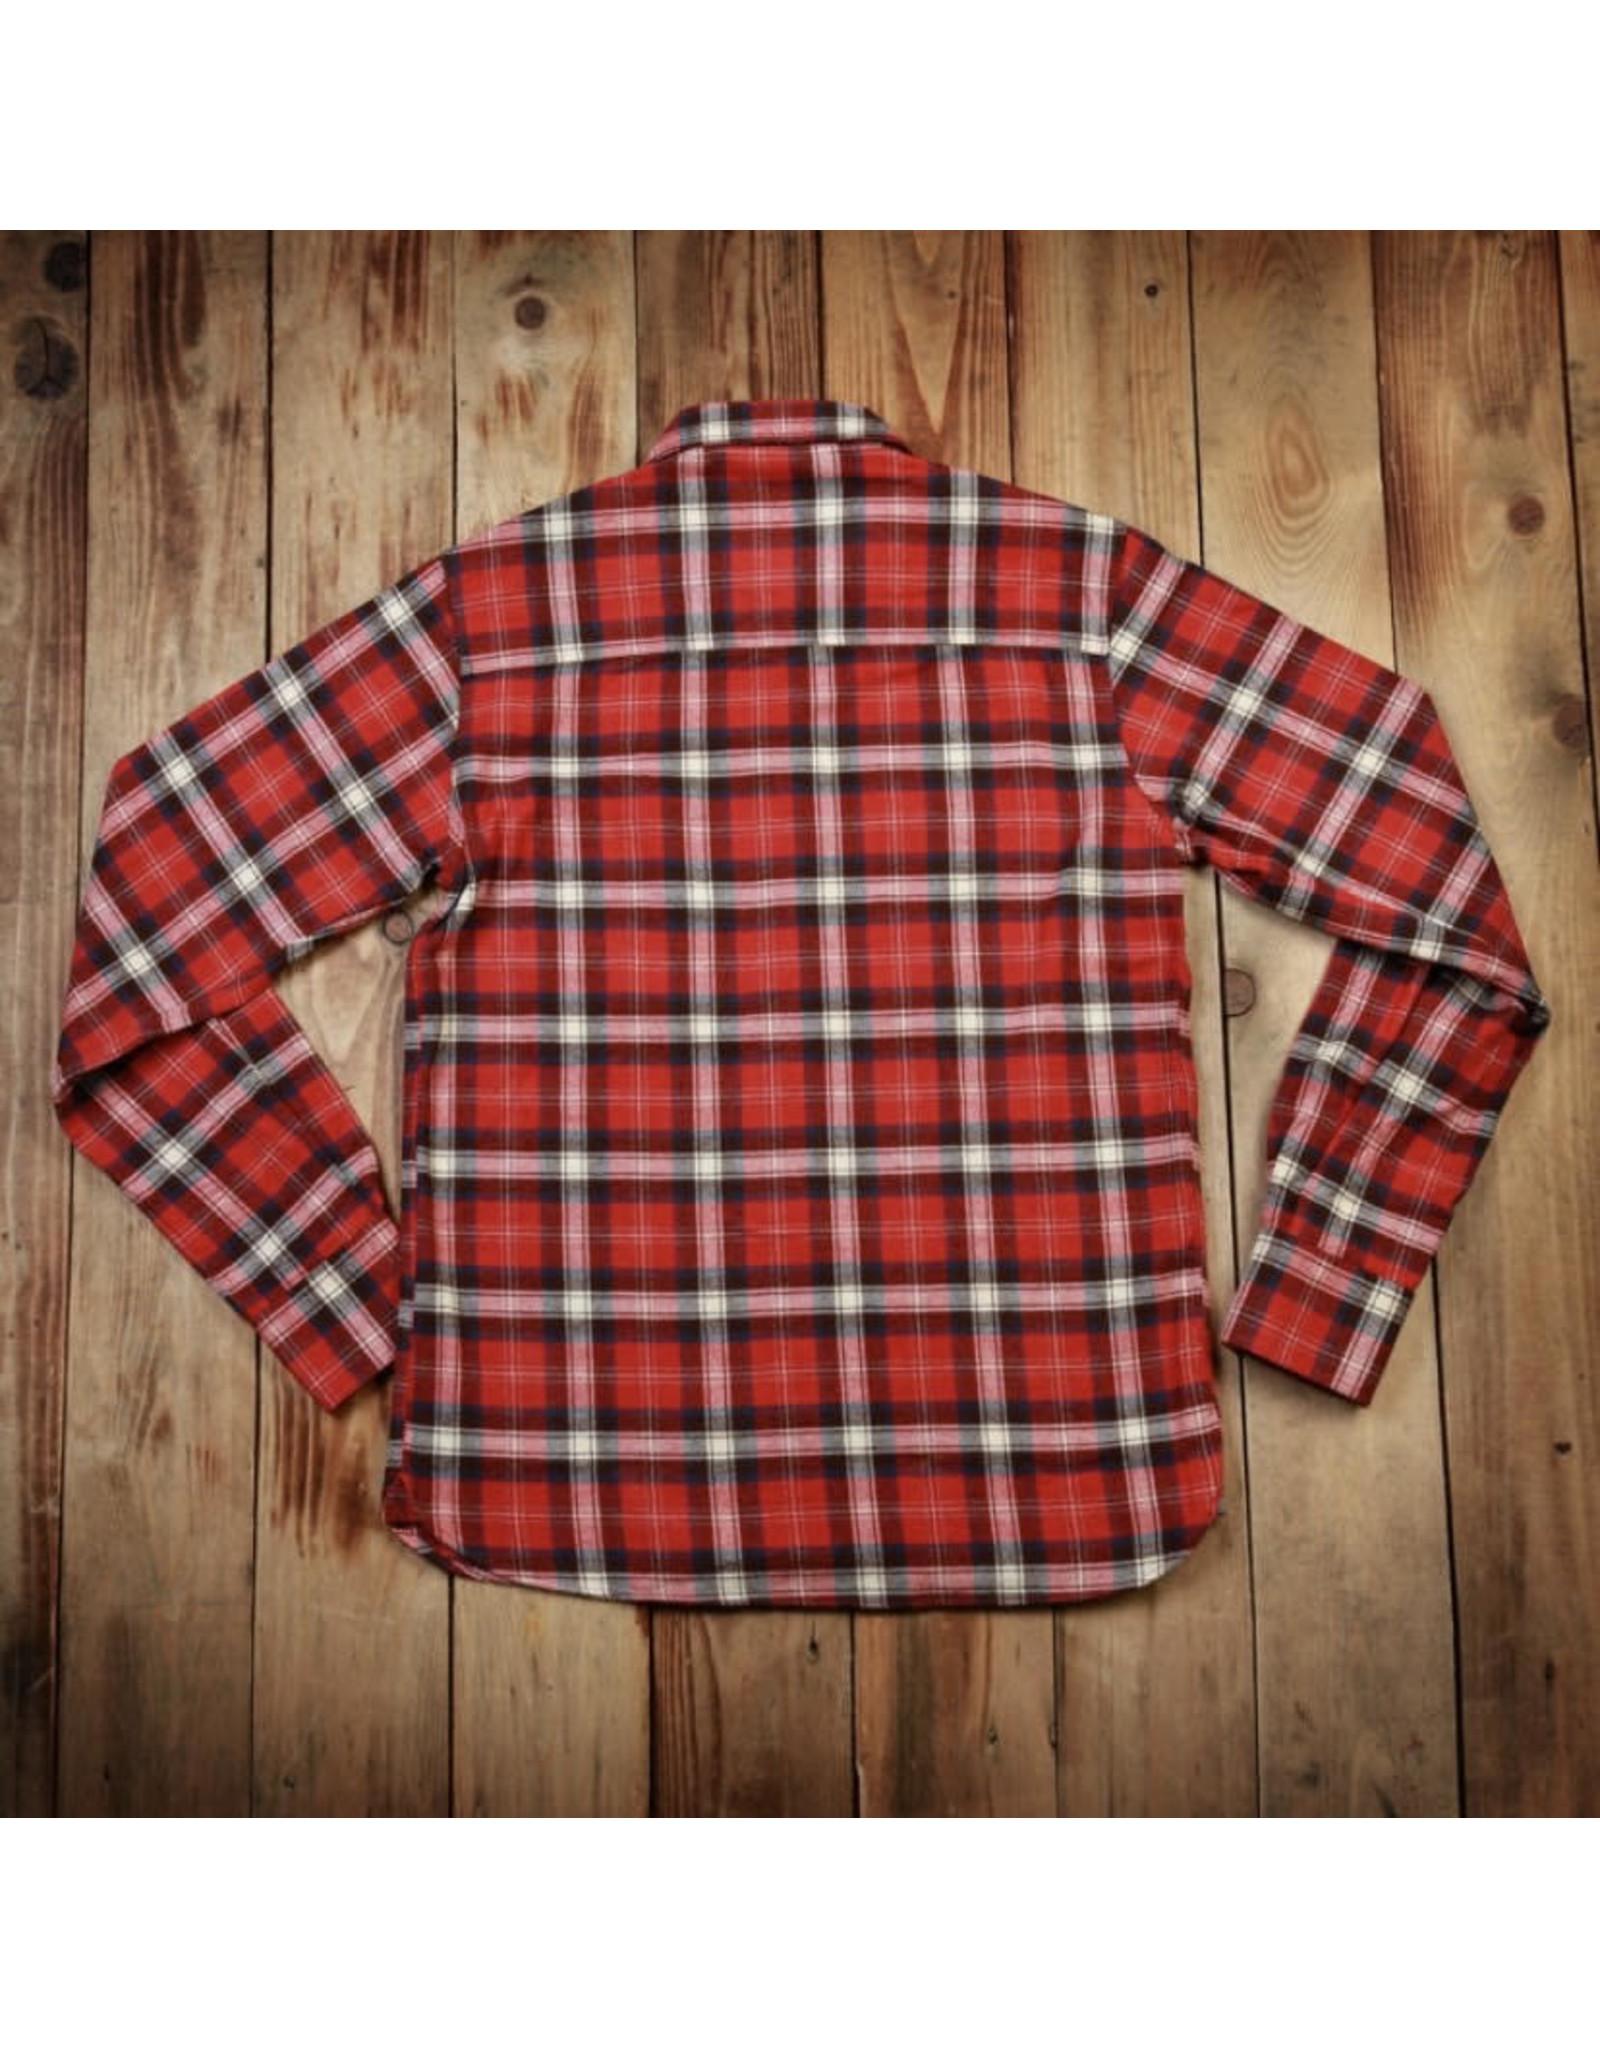 Pike Brothers Roamer Shirt